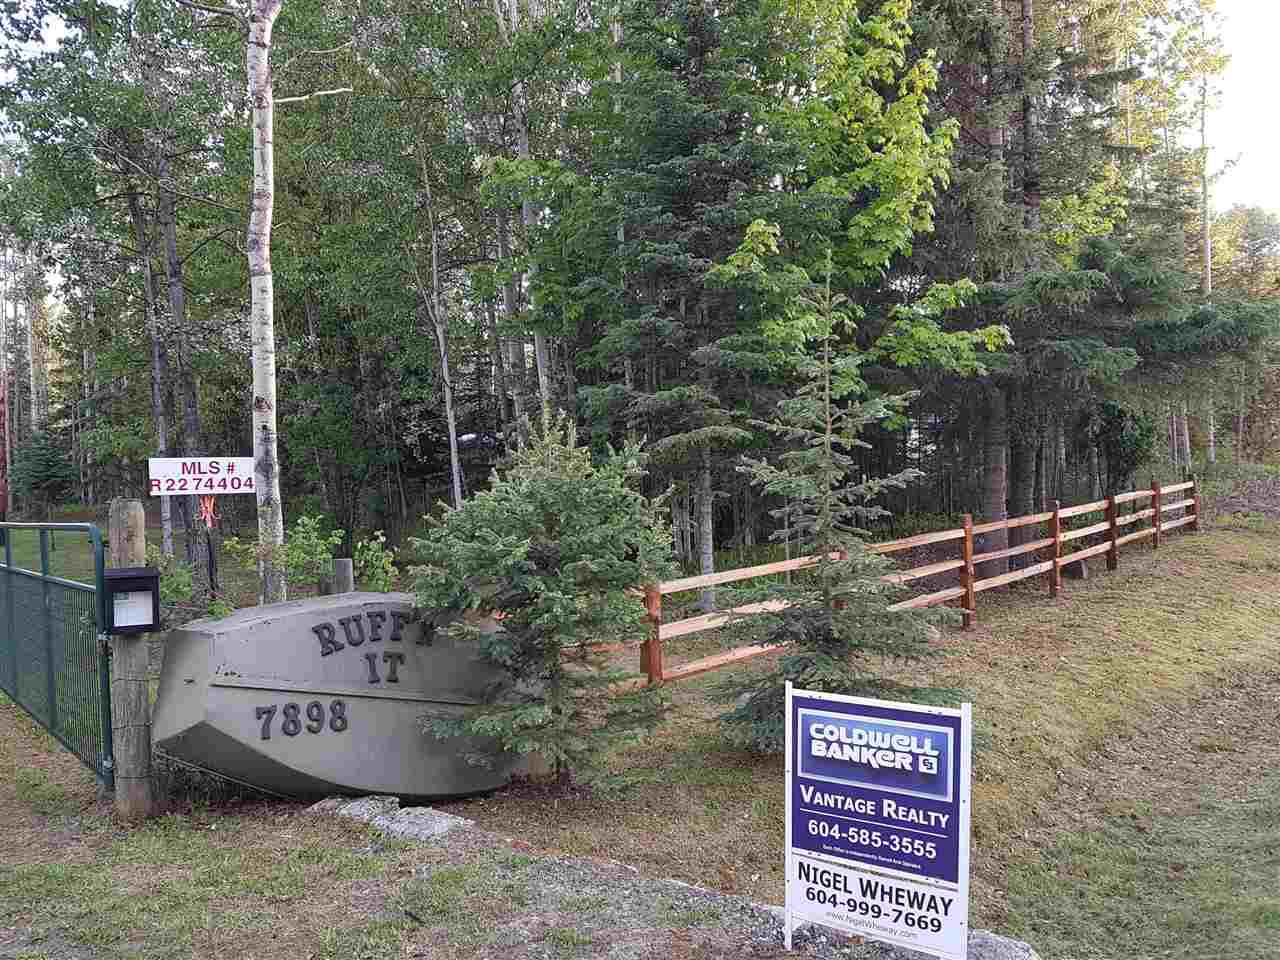 Photo 8: Photos: 7898 DEAN Road in Bridge Lake: Bridge Lake/Sheridan Lake House for sale (100 Mile House (Zone 10))  : MLS®# R2274404